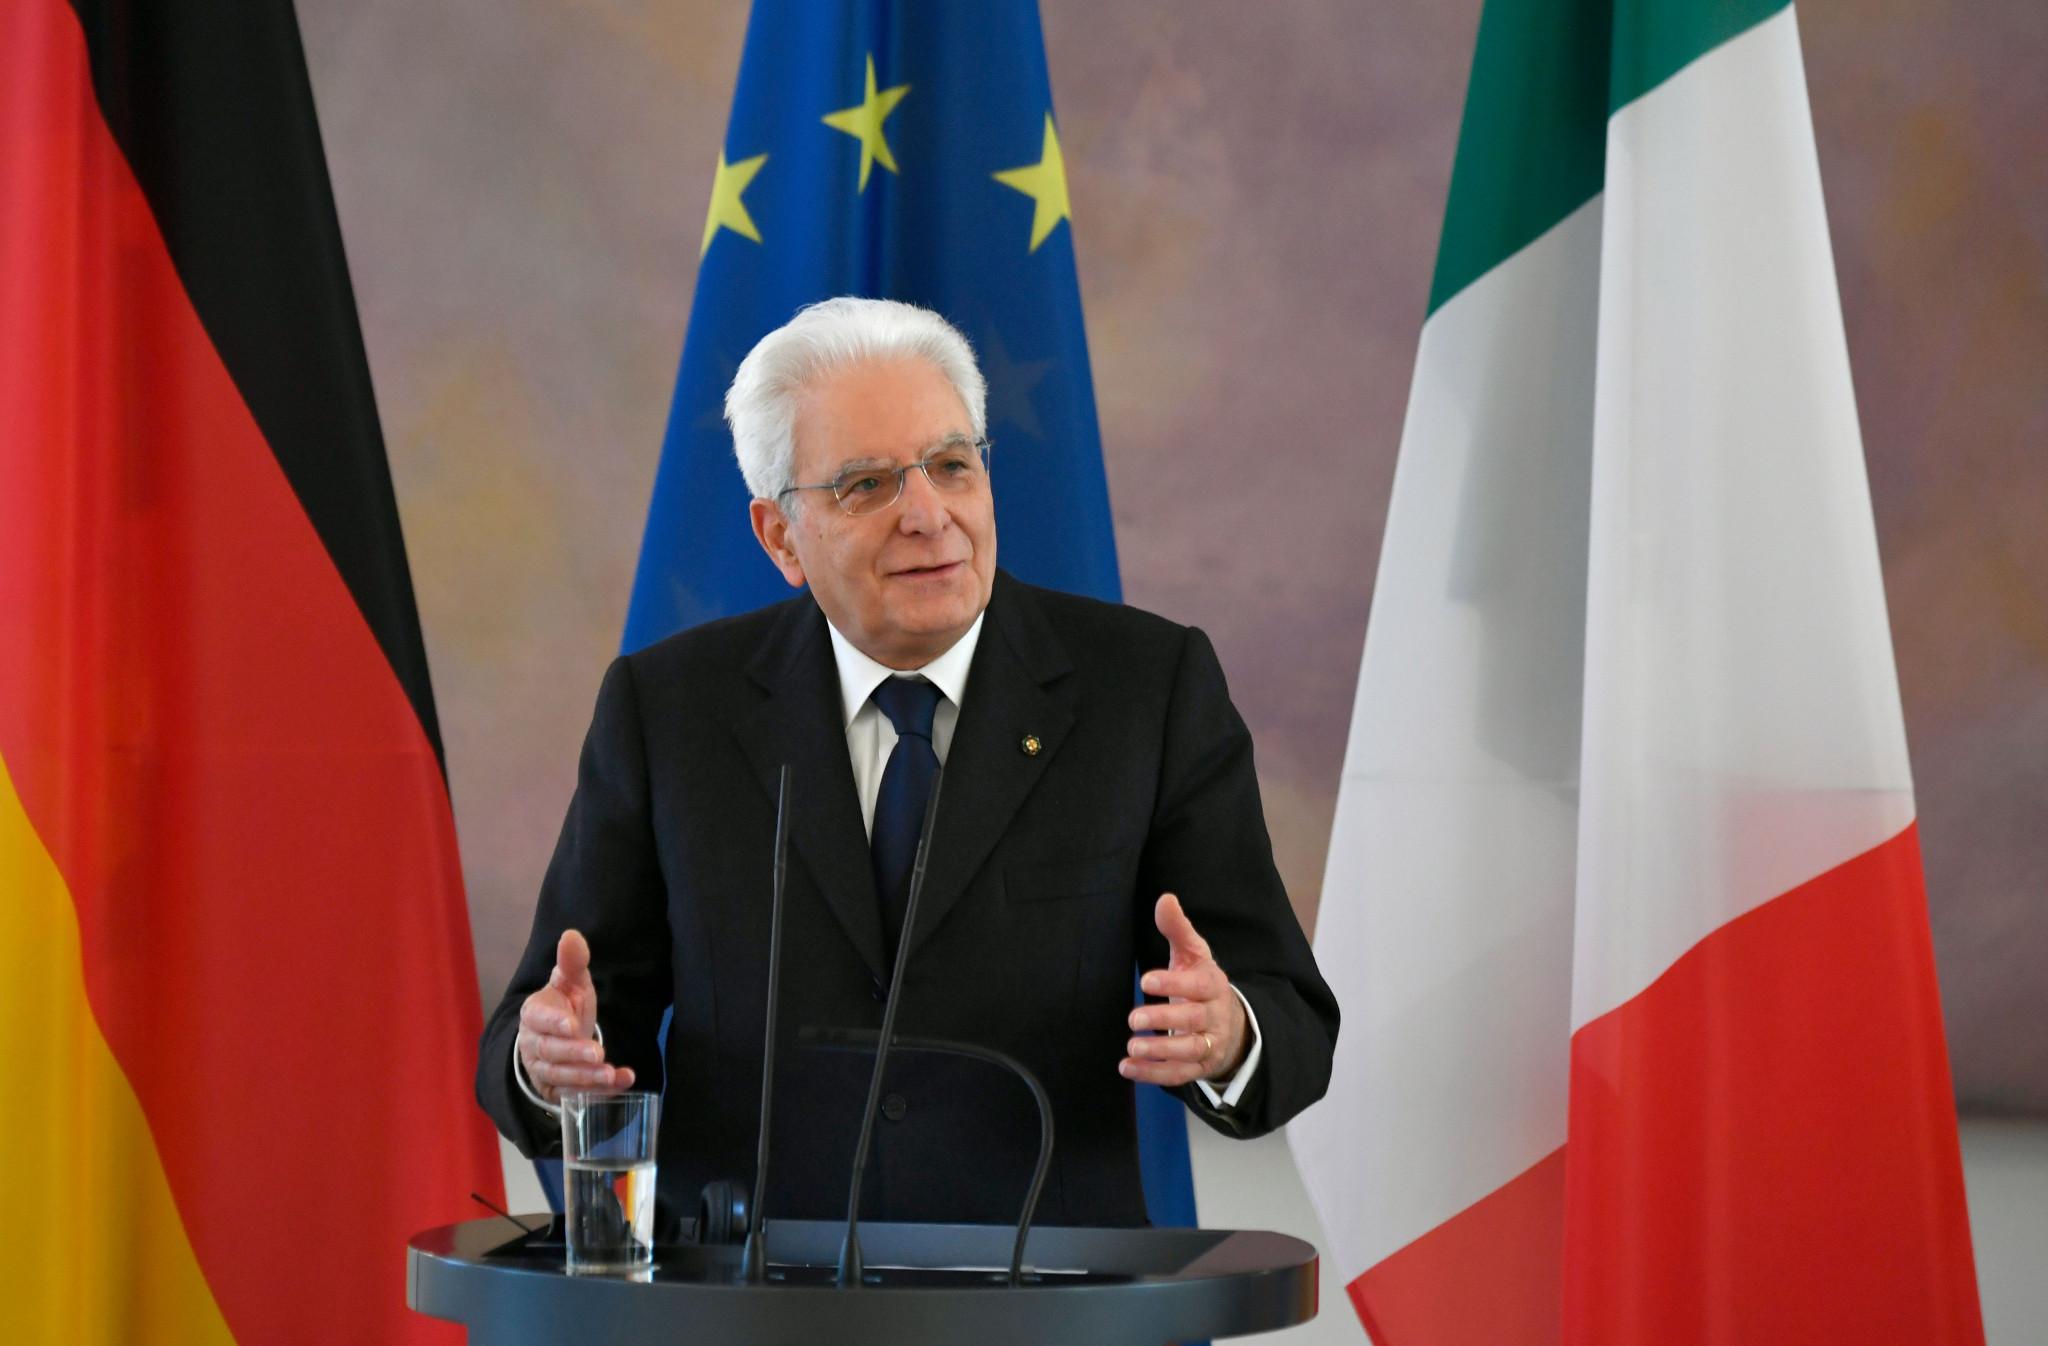 Italy's President Sergio Mattarella has already promised the